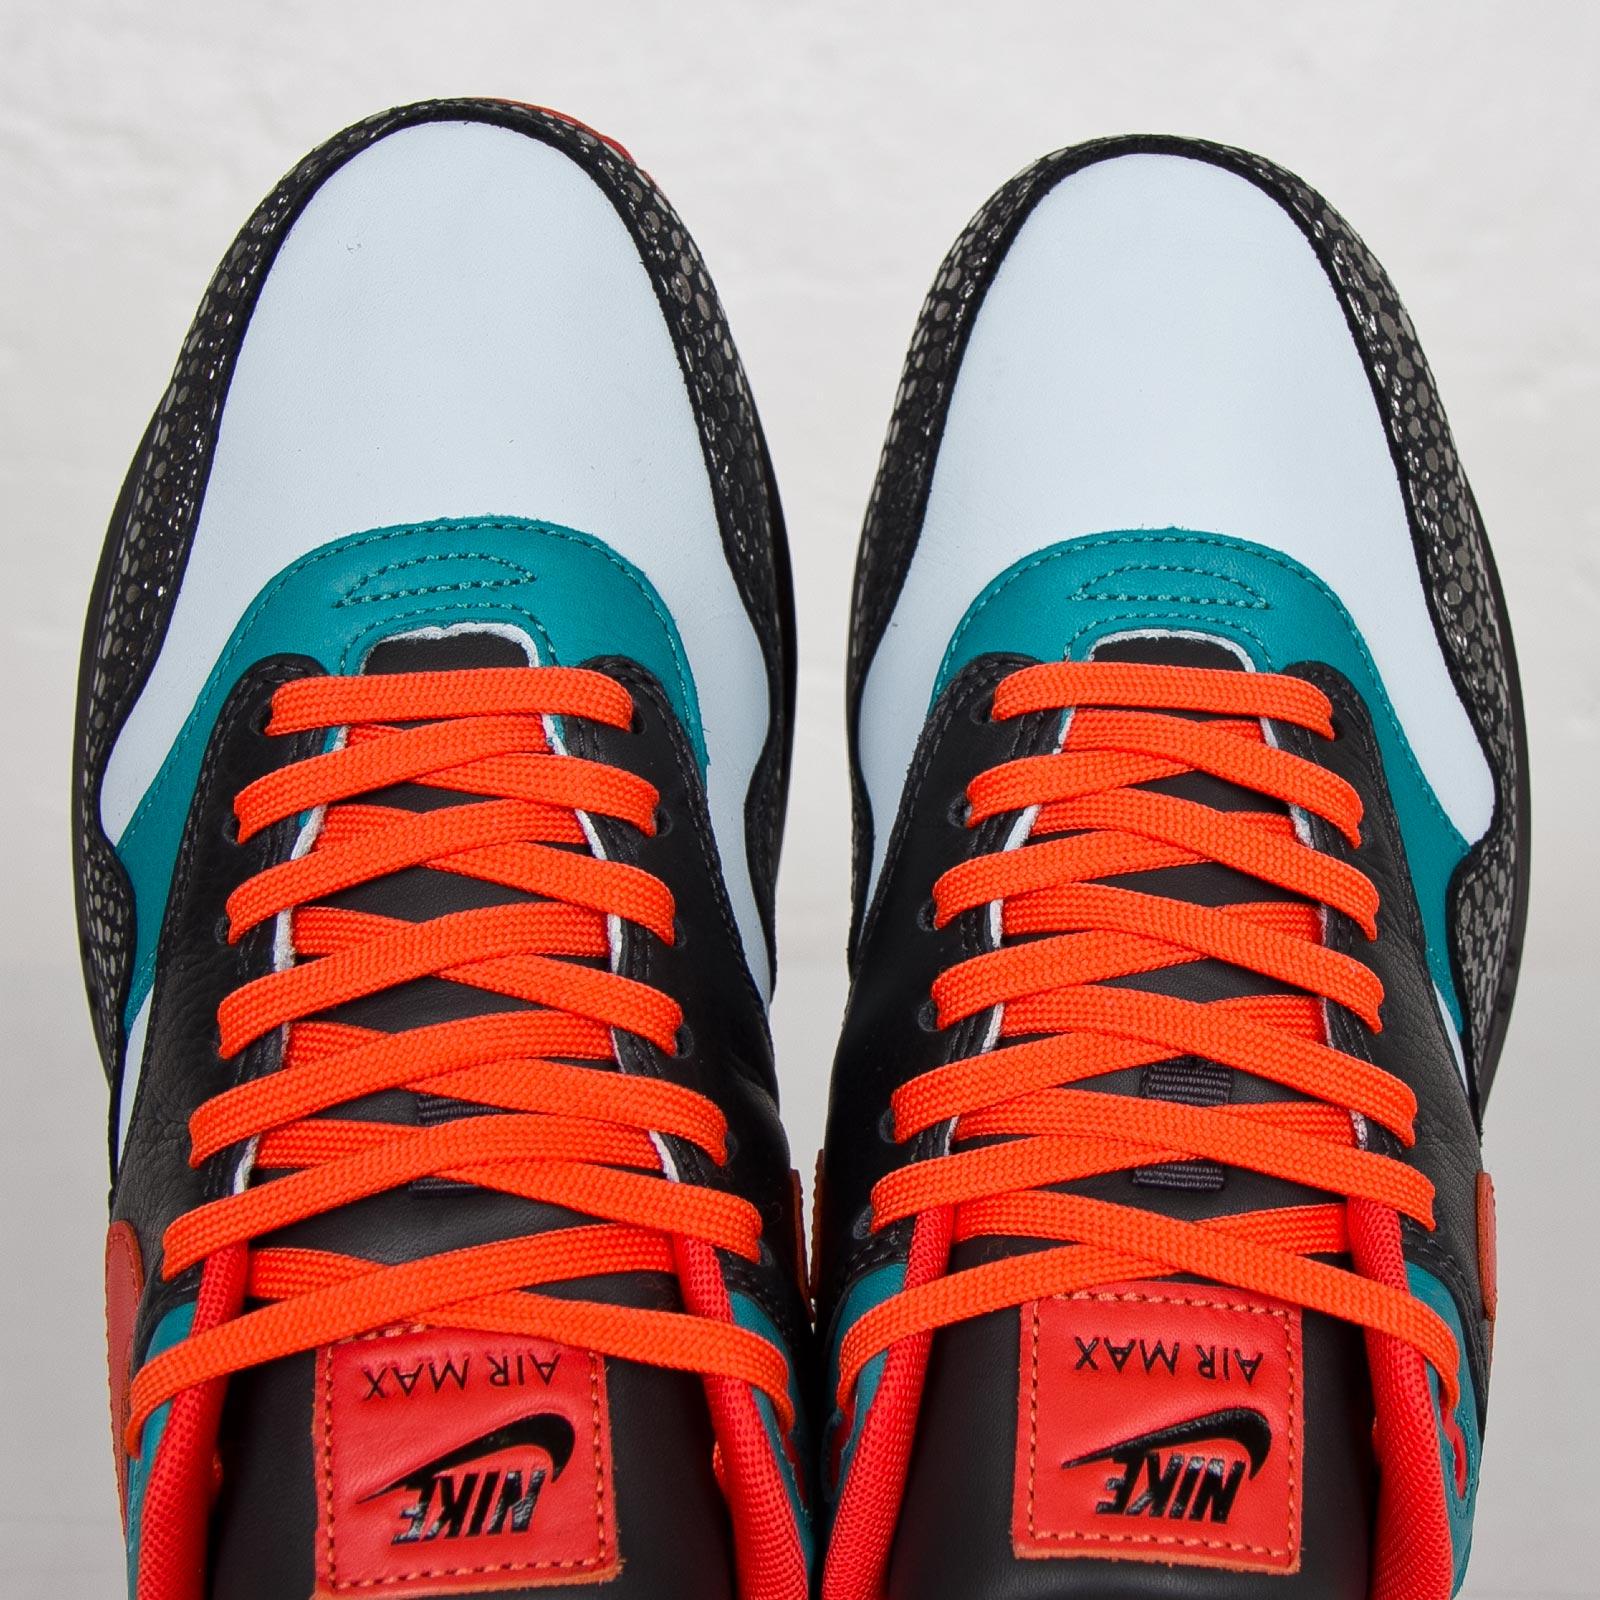 Nike Air Max Lunar1 Deluxe QS 717598 400 Sneakersnstuff